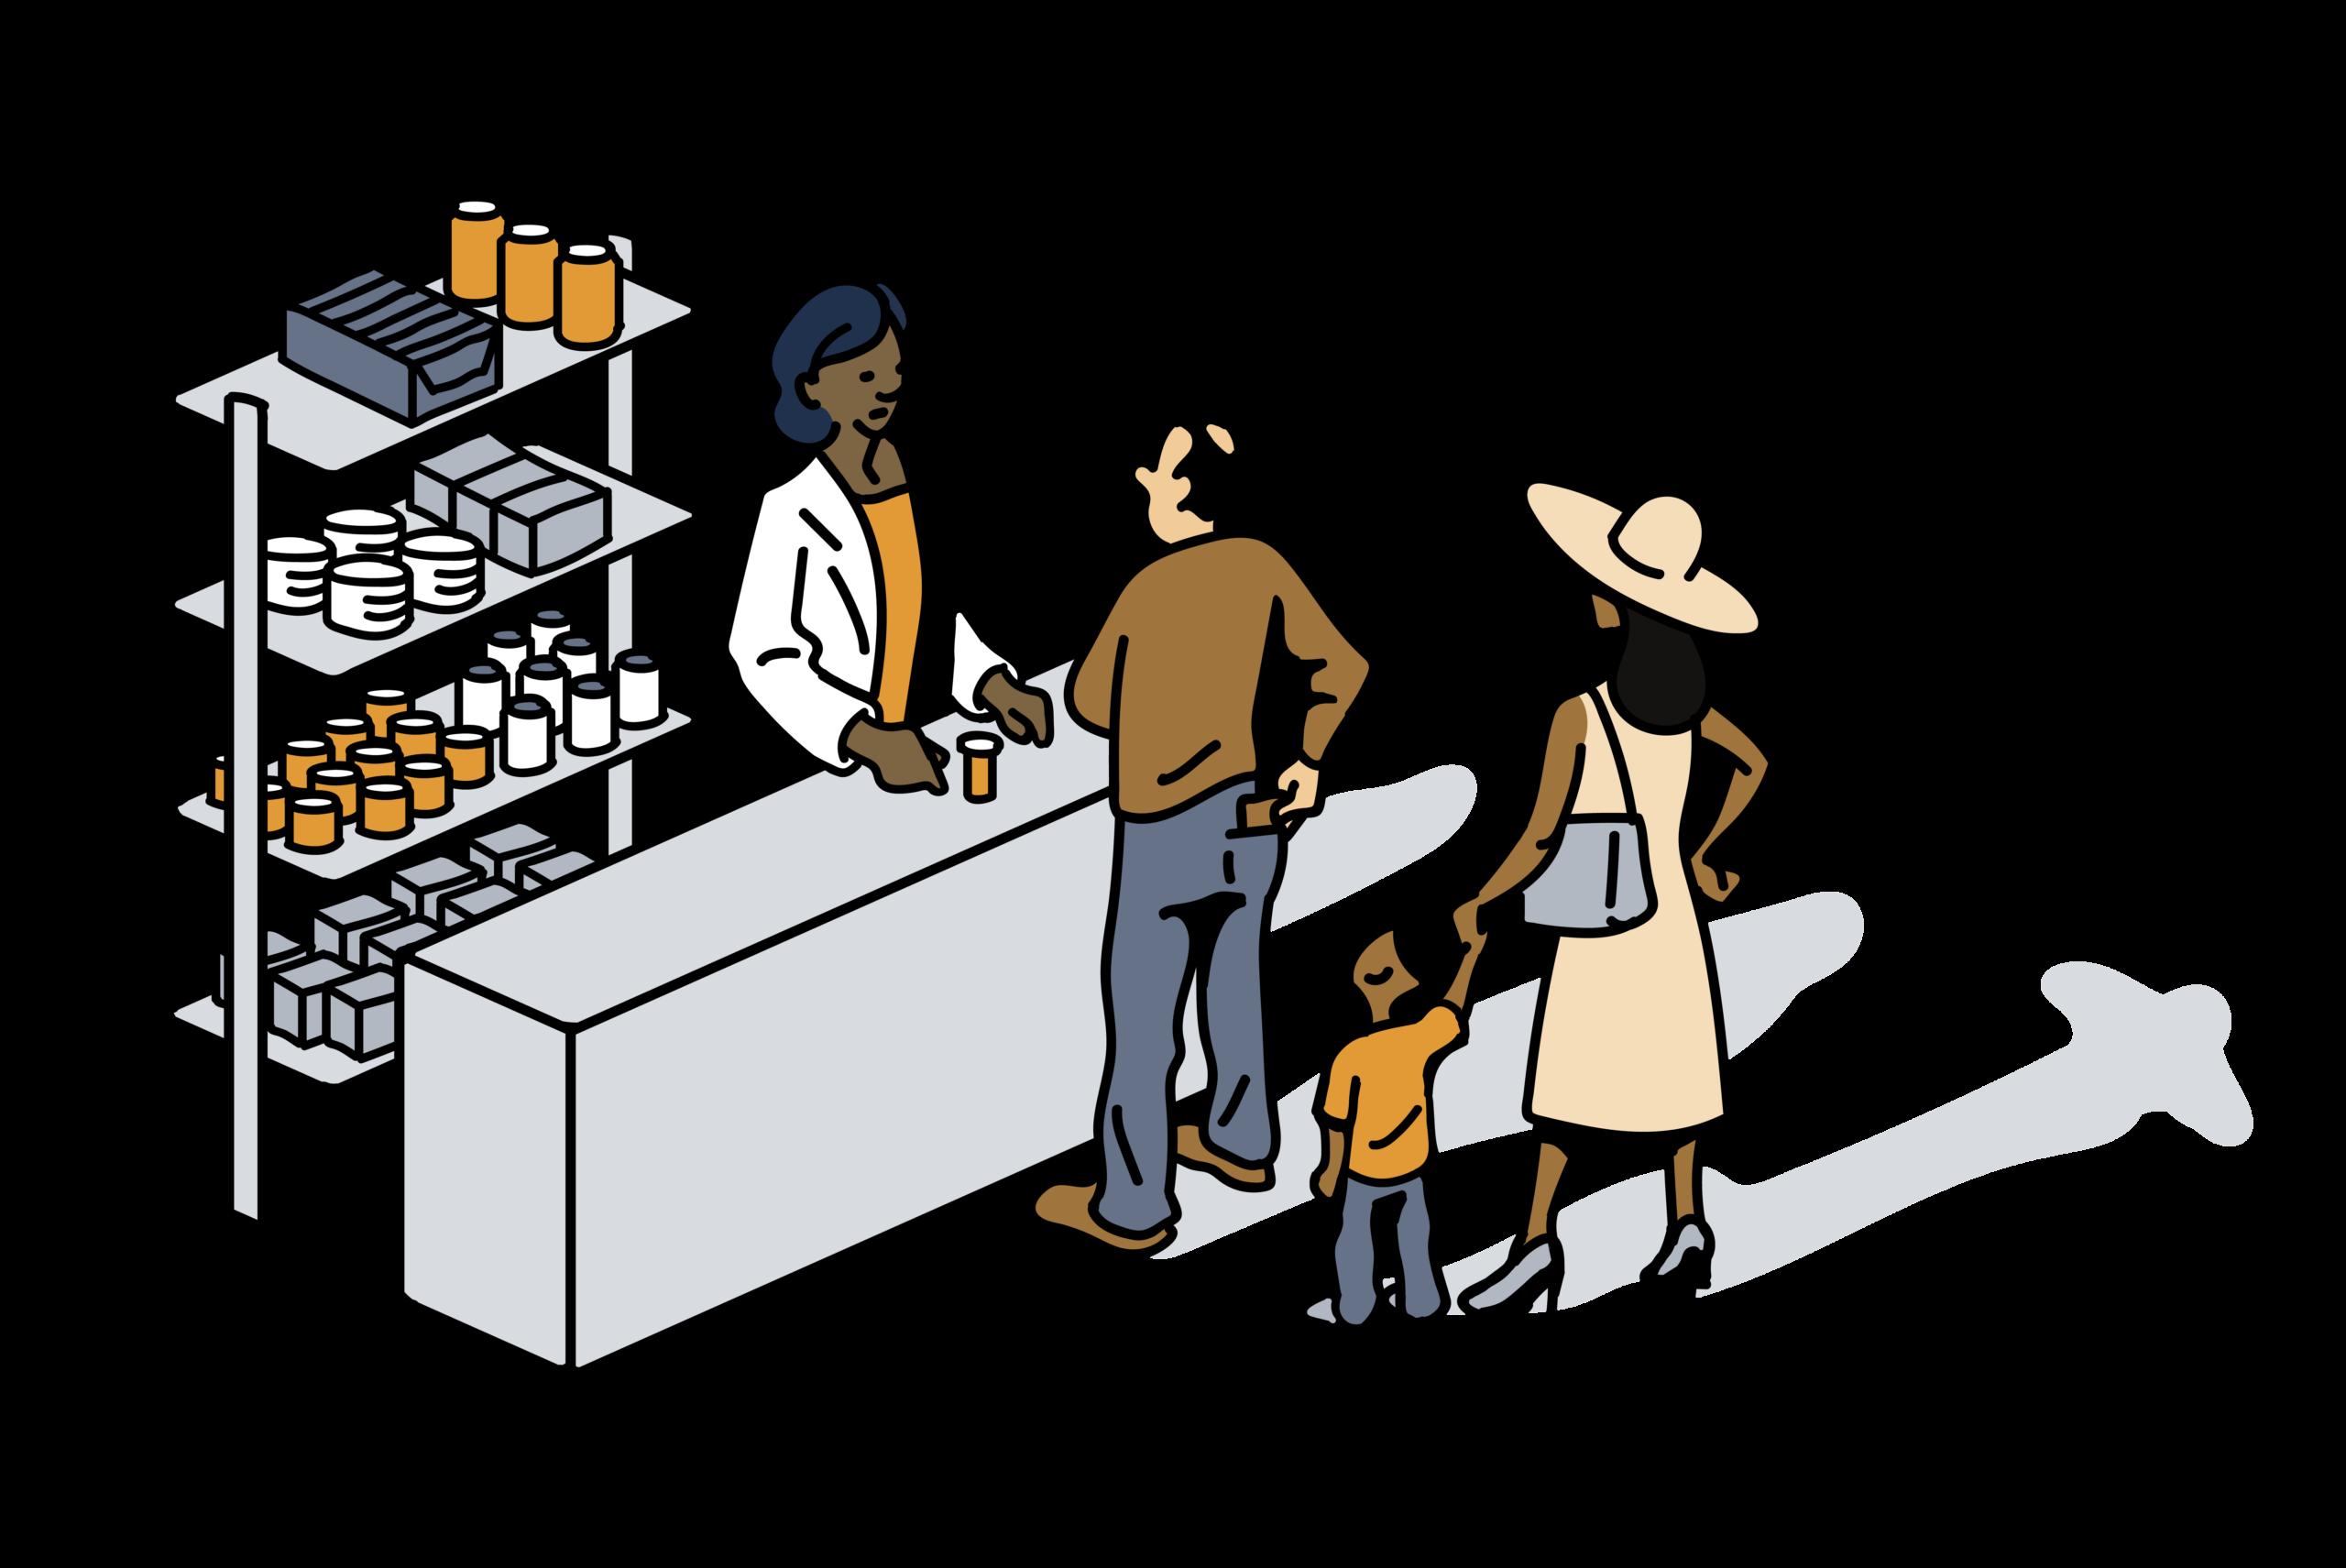 UNC_OpioidResearch_illustrations-05